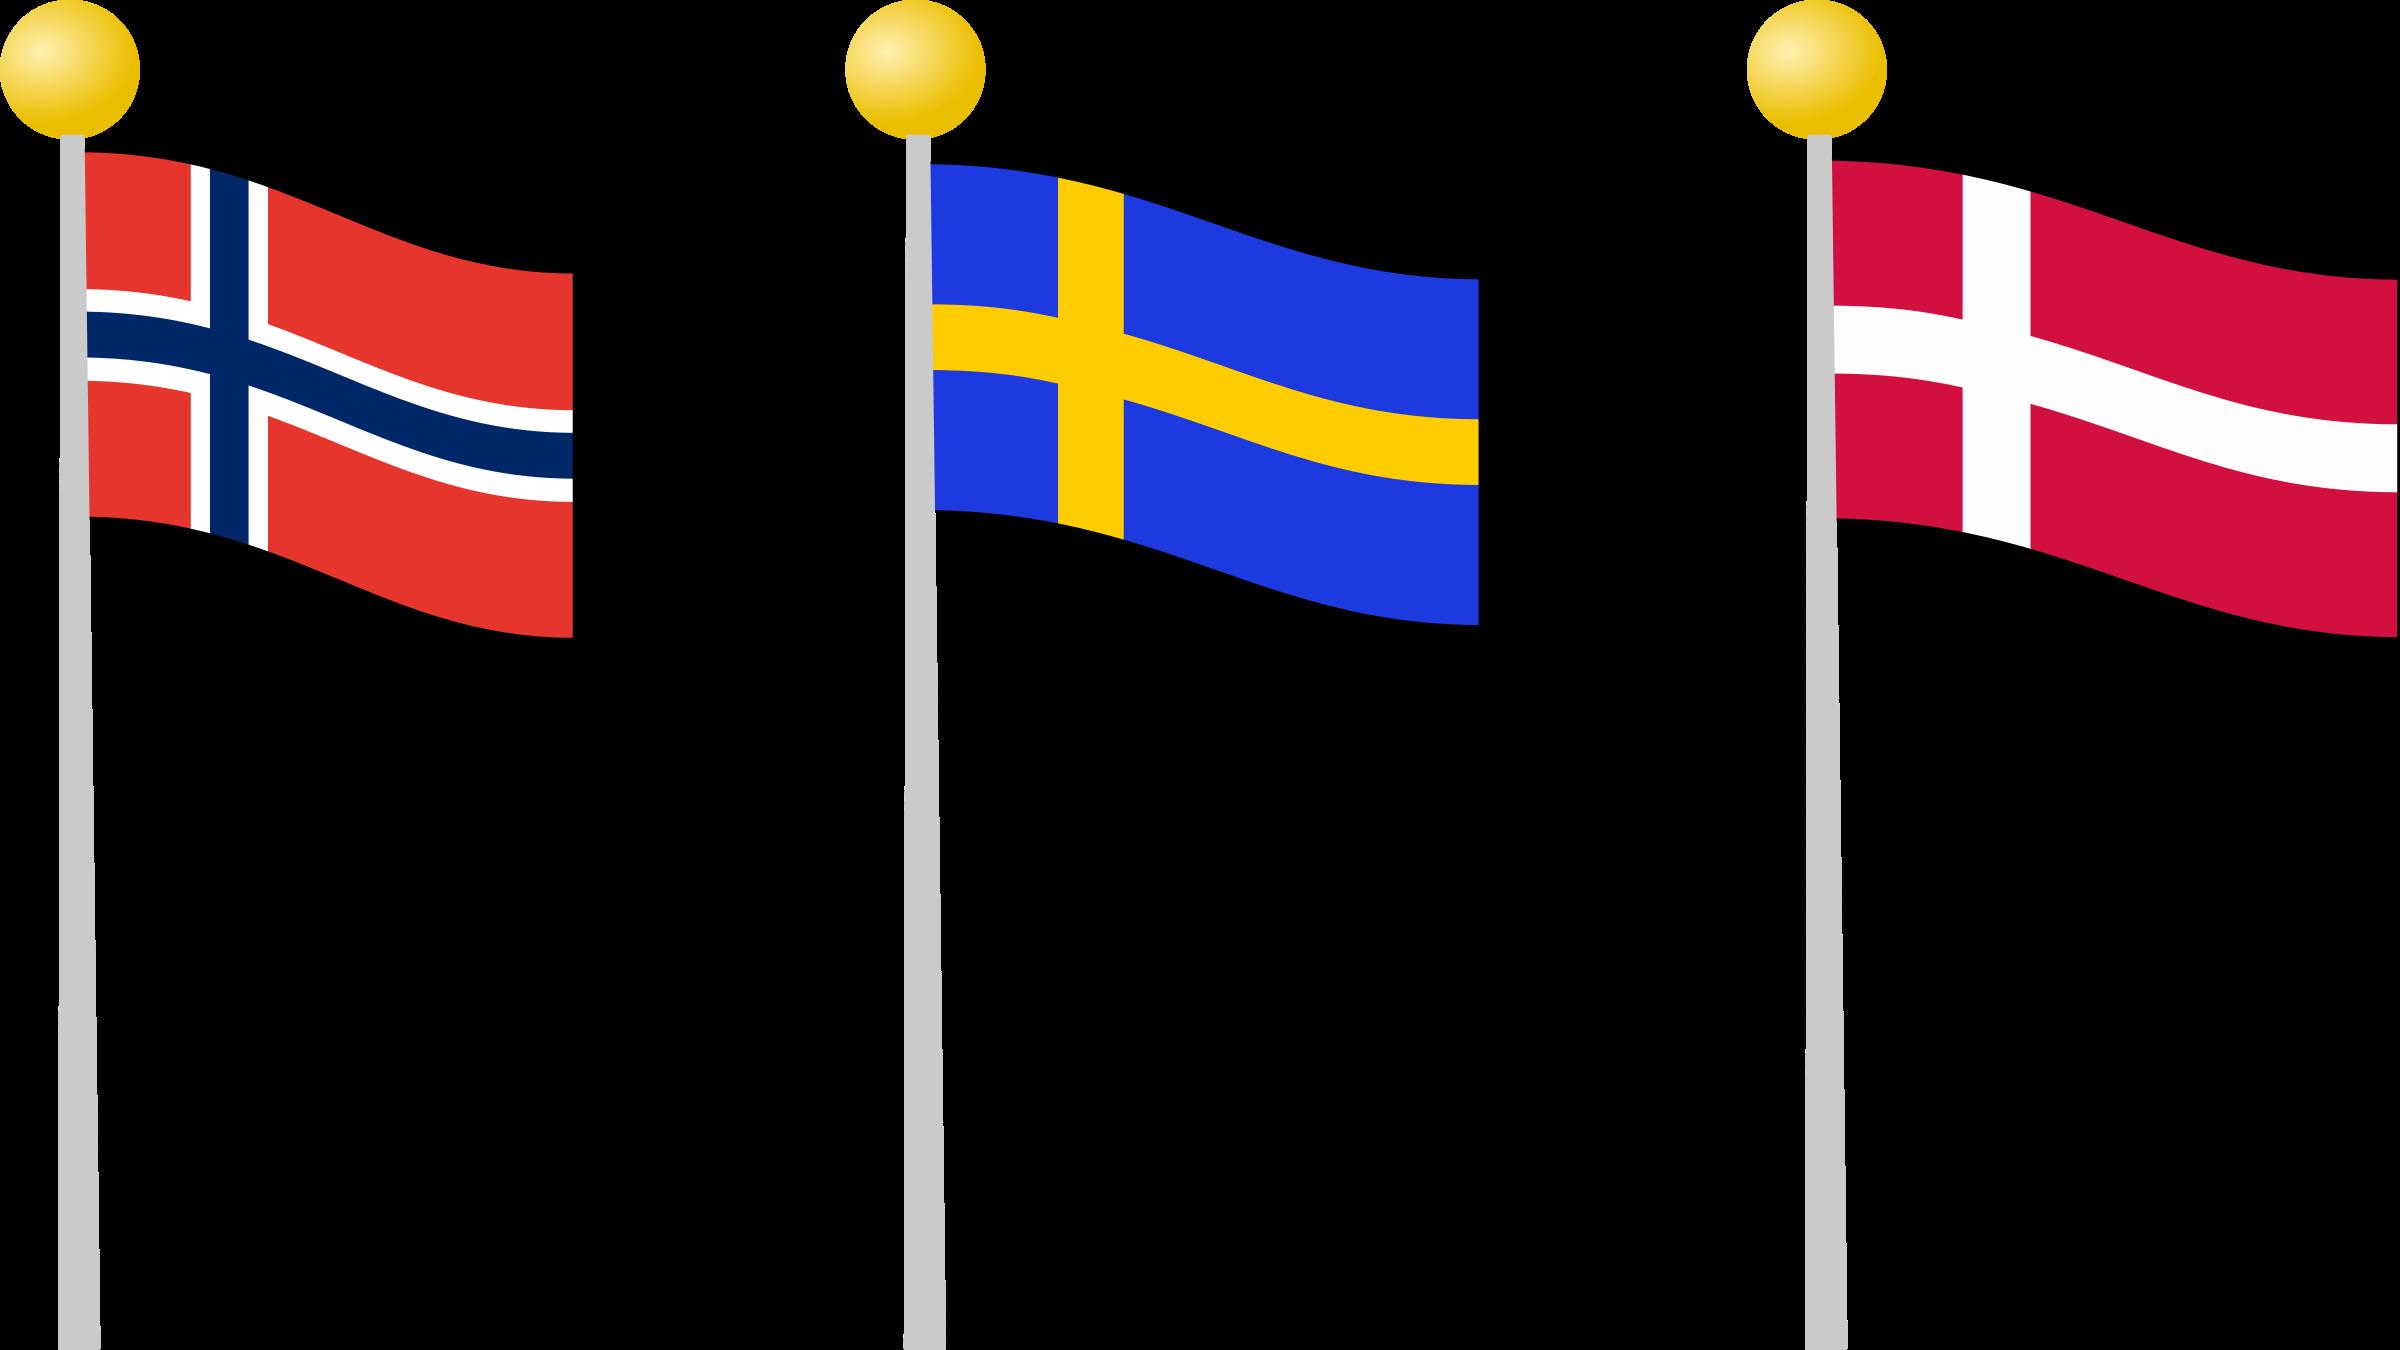 Scandinavia clipart #12, Download drawings